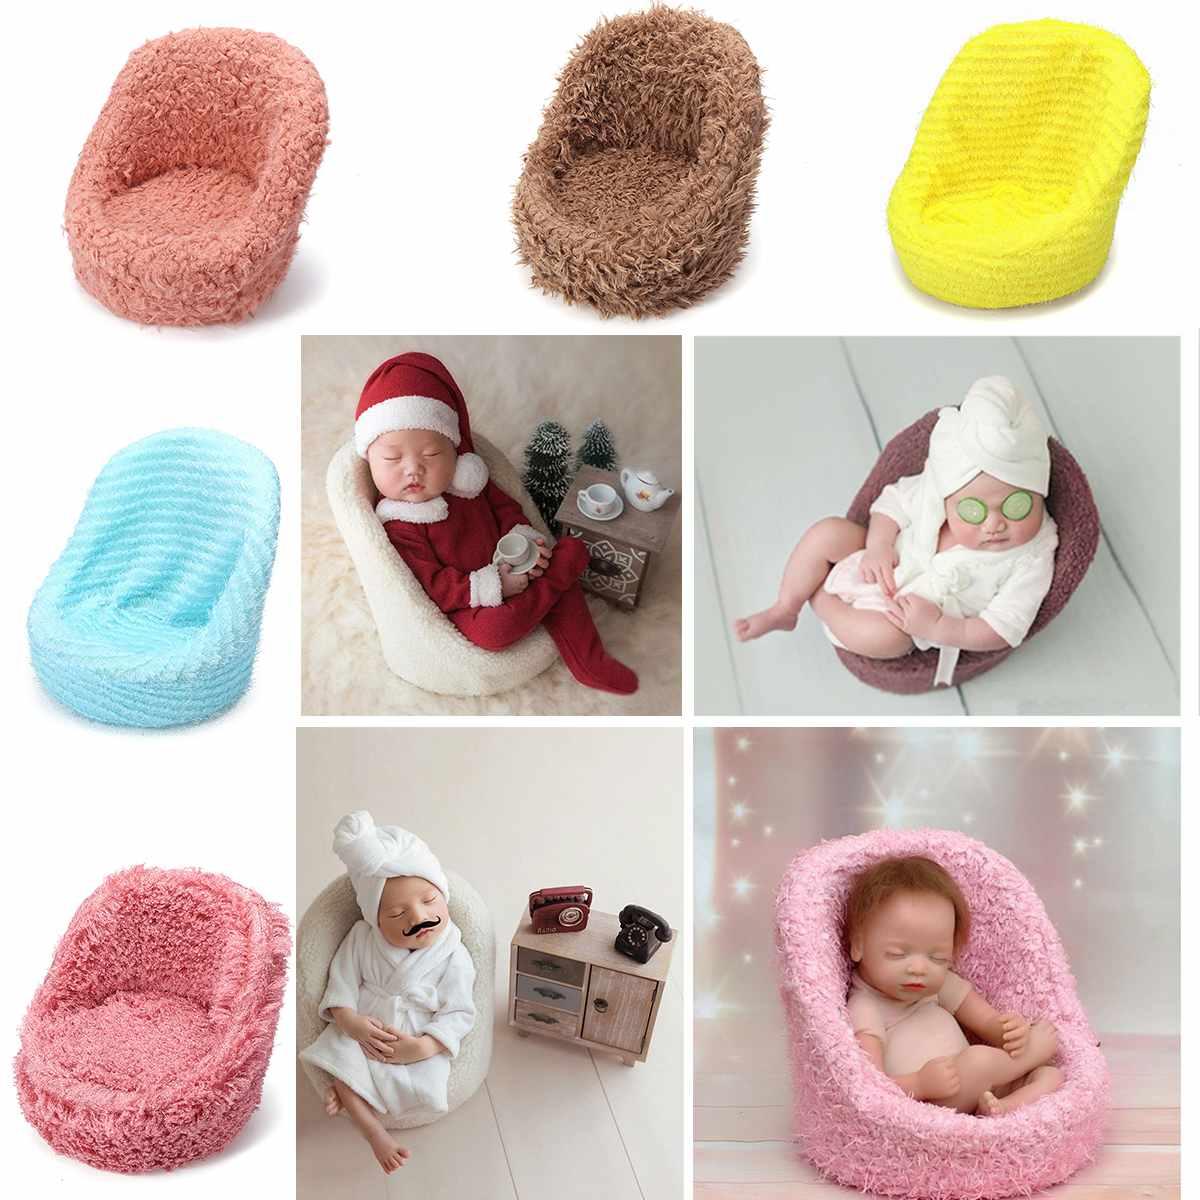 Children's Studio Photography Props Photographing Newborn Chair Sofa Decor Mini Baby Sitting Chair Infant Birth Shooting Tool